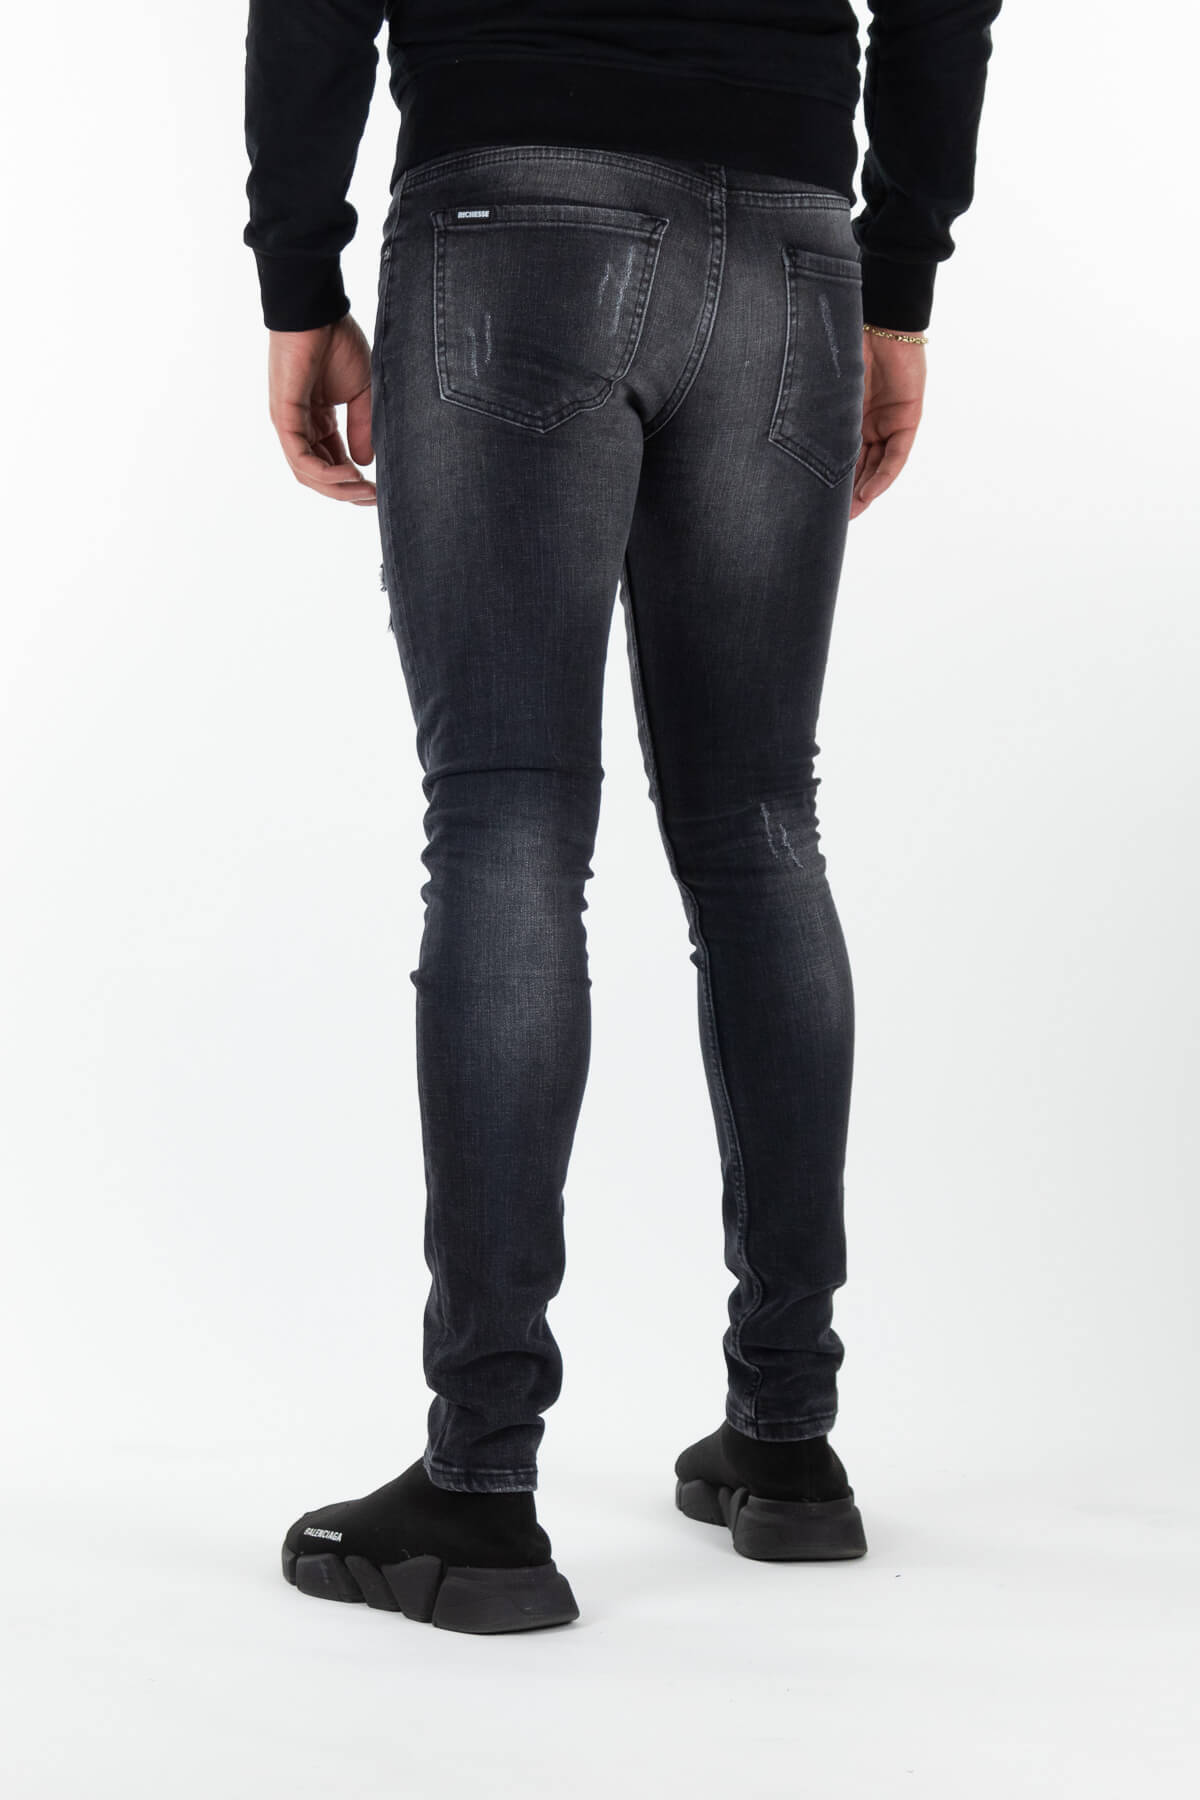 Sevilla Deluxe Dark Jeans-4